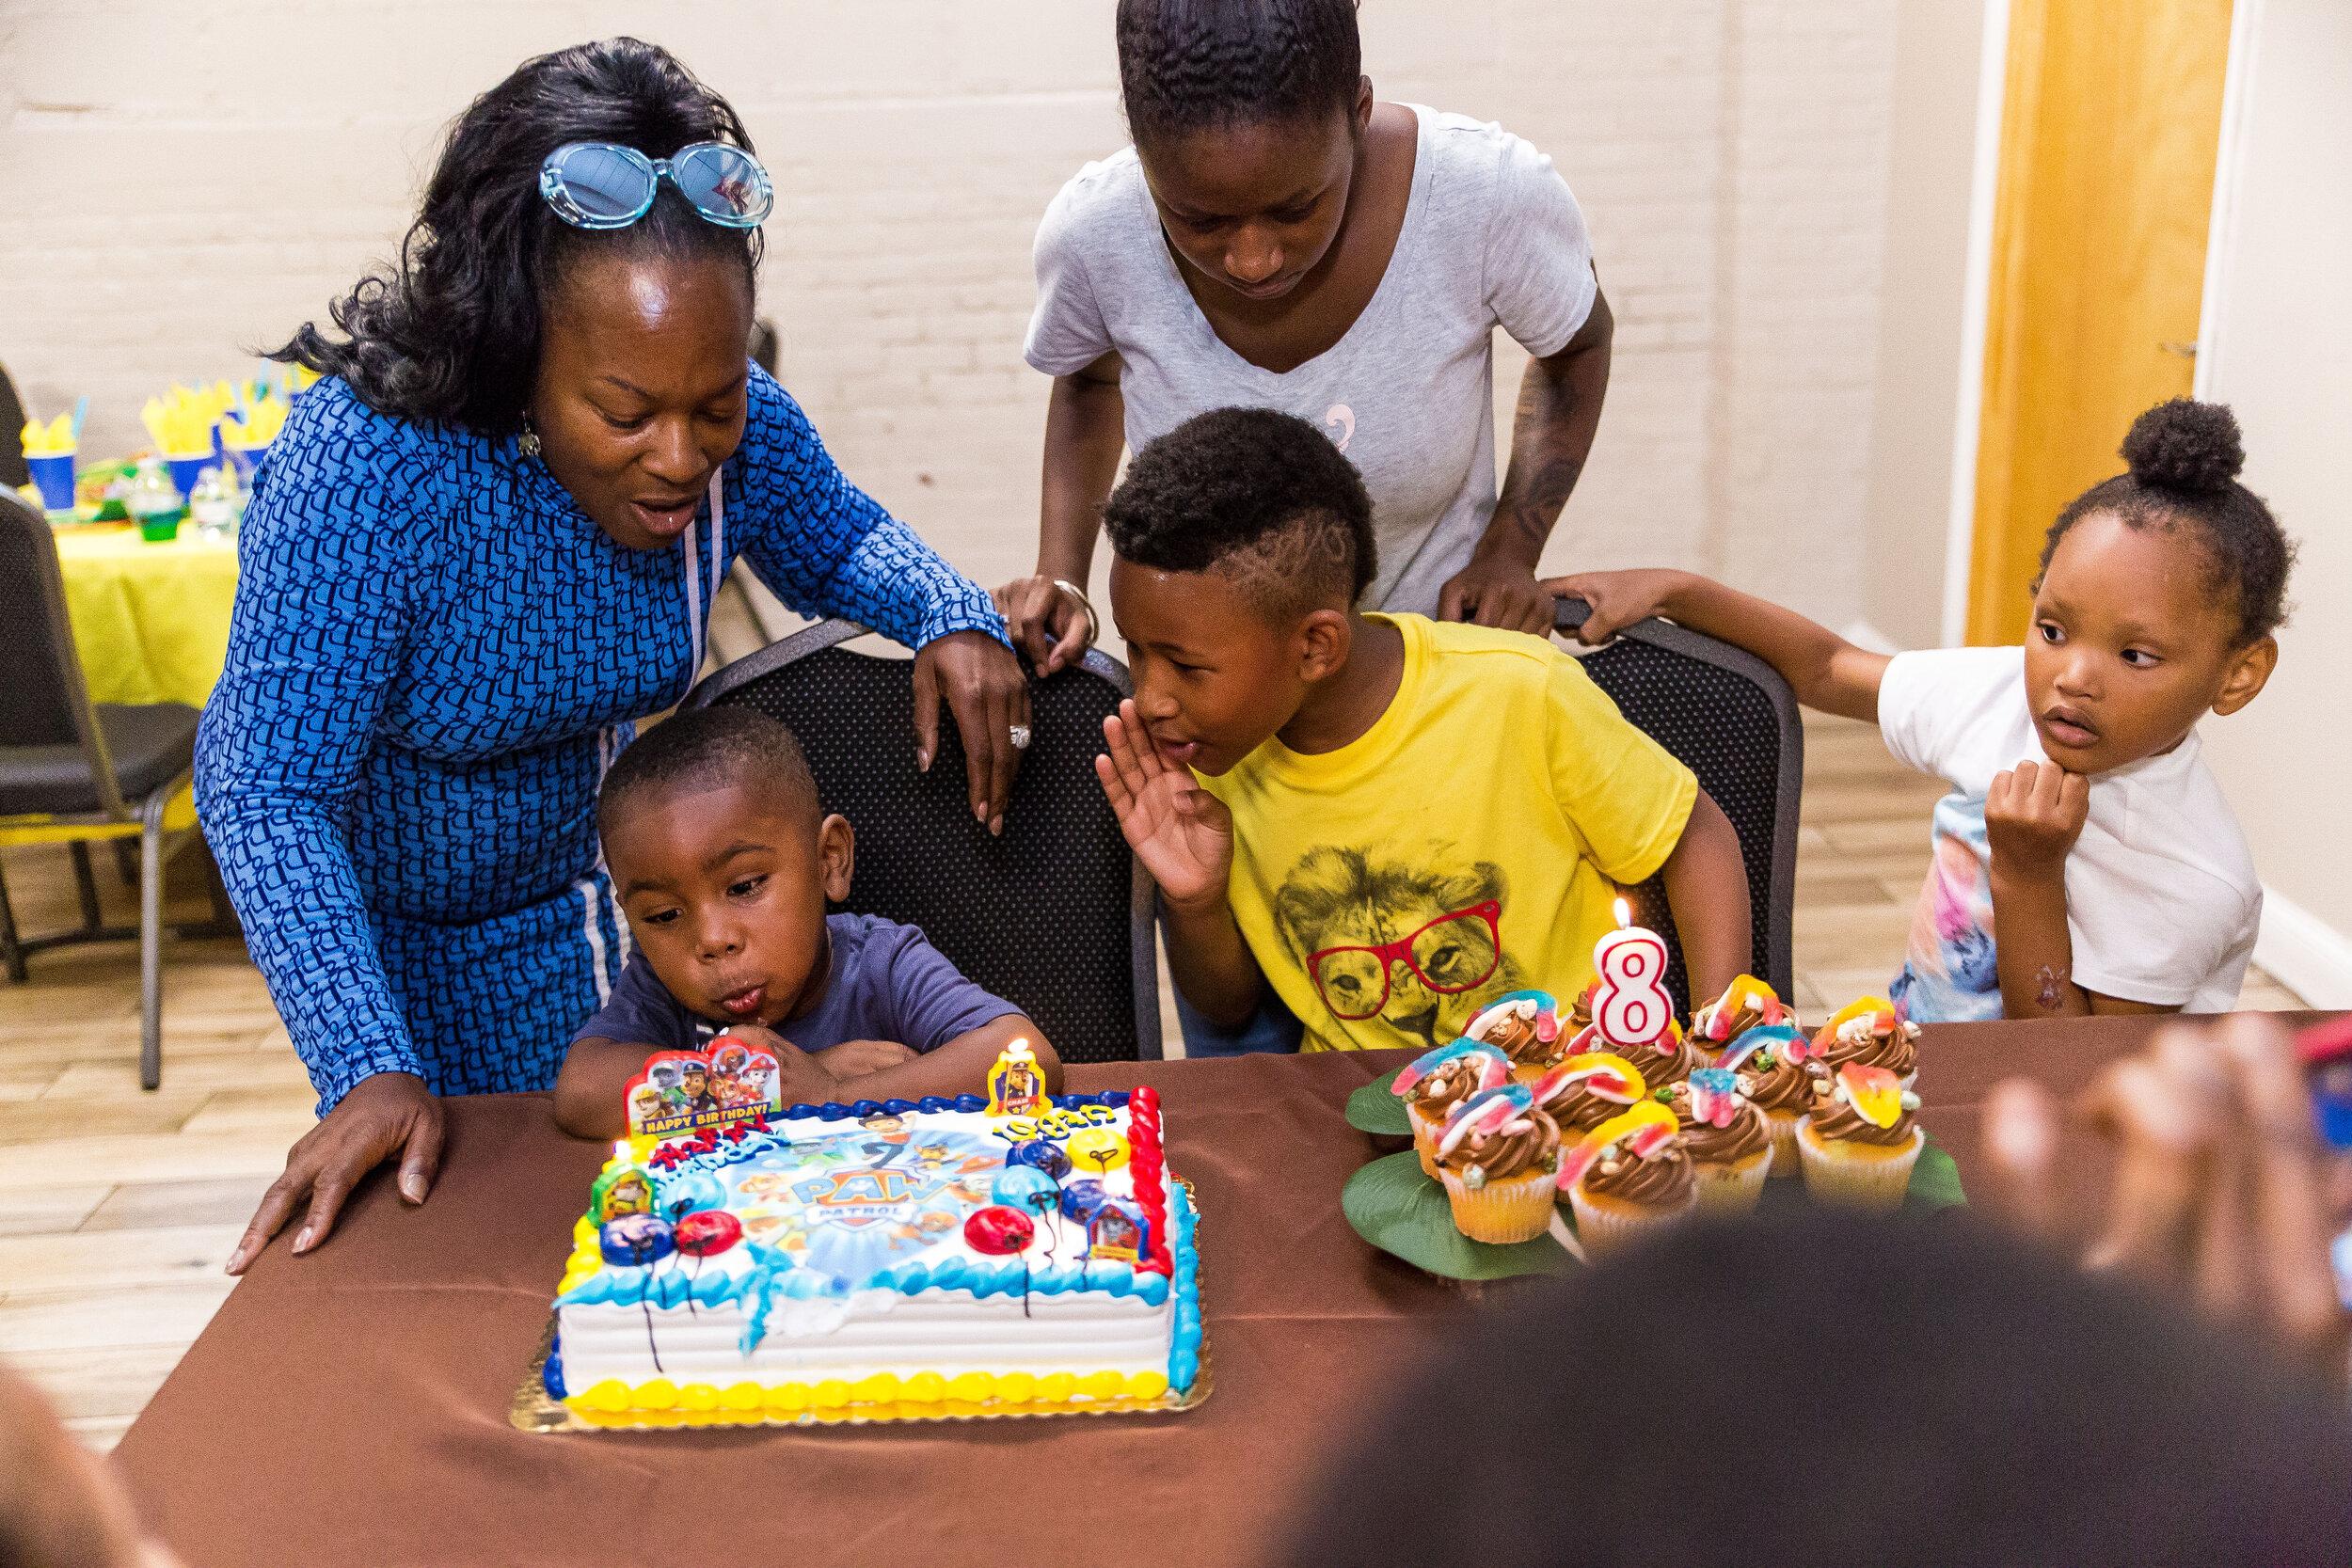 Take the Cake_Live Love Lens Photography summer 2019 (146 of 149).jpg